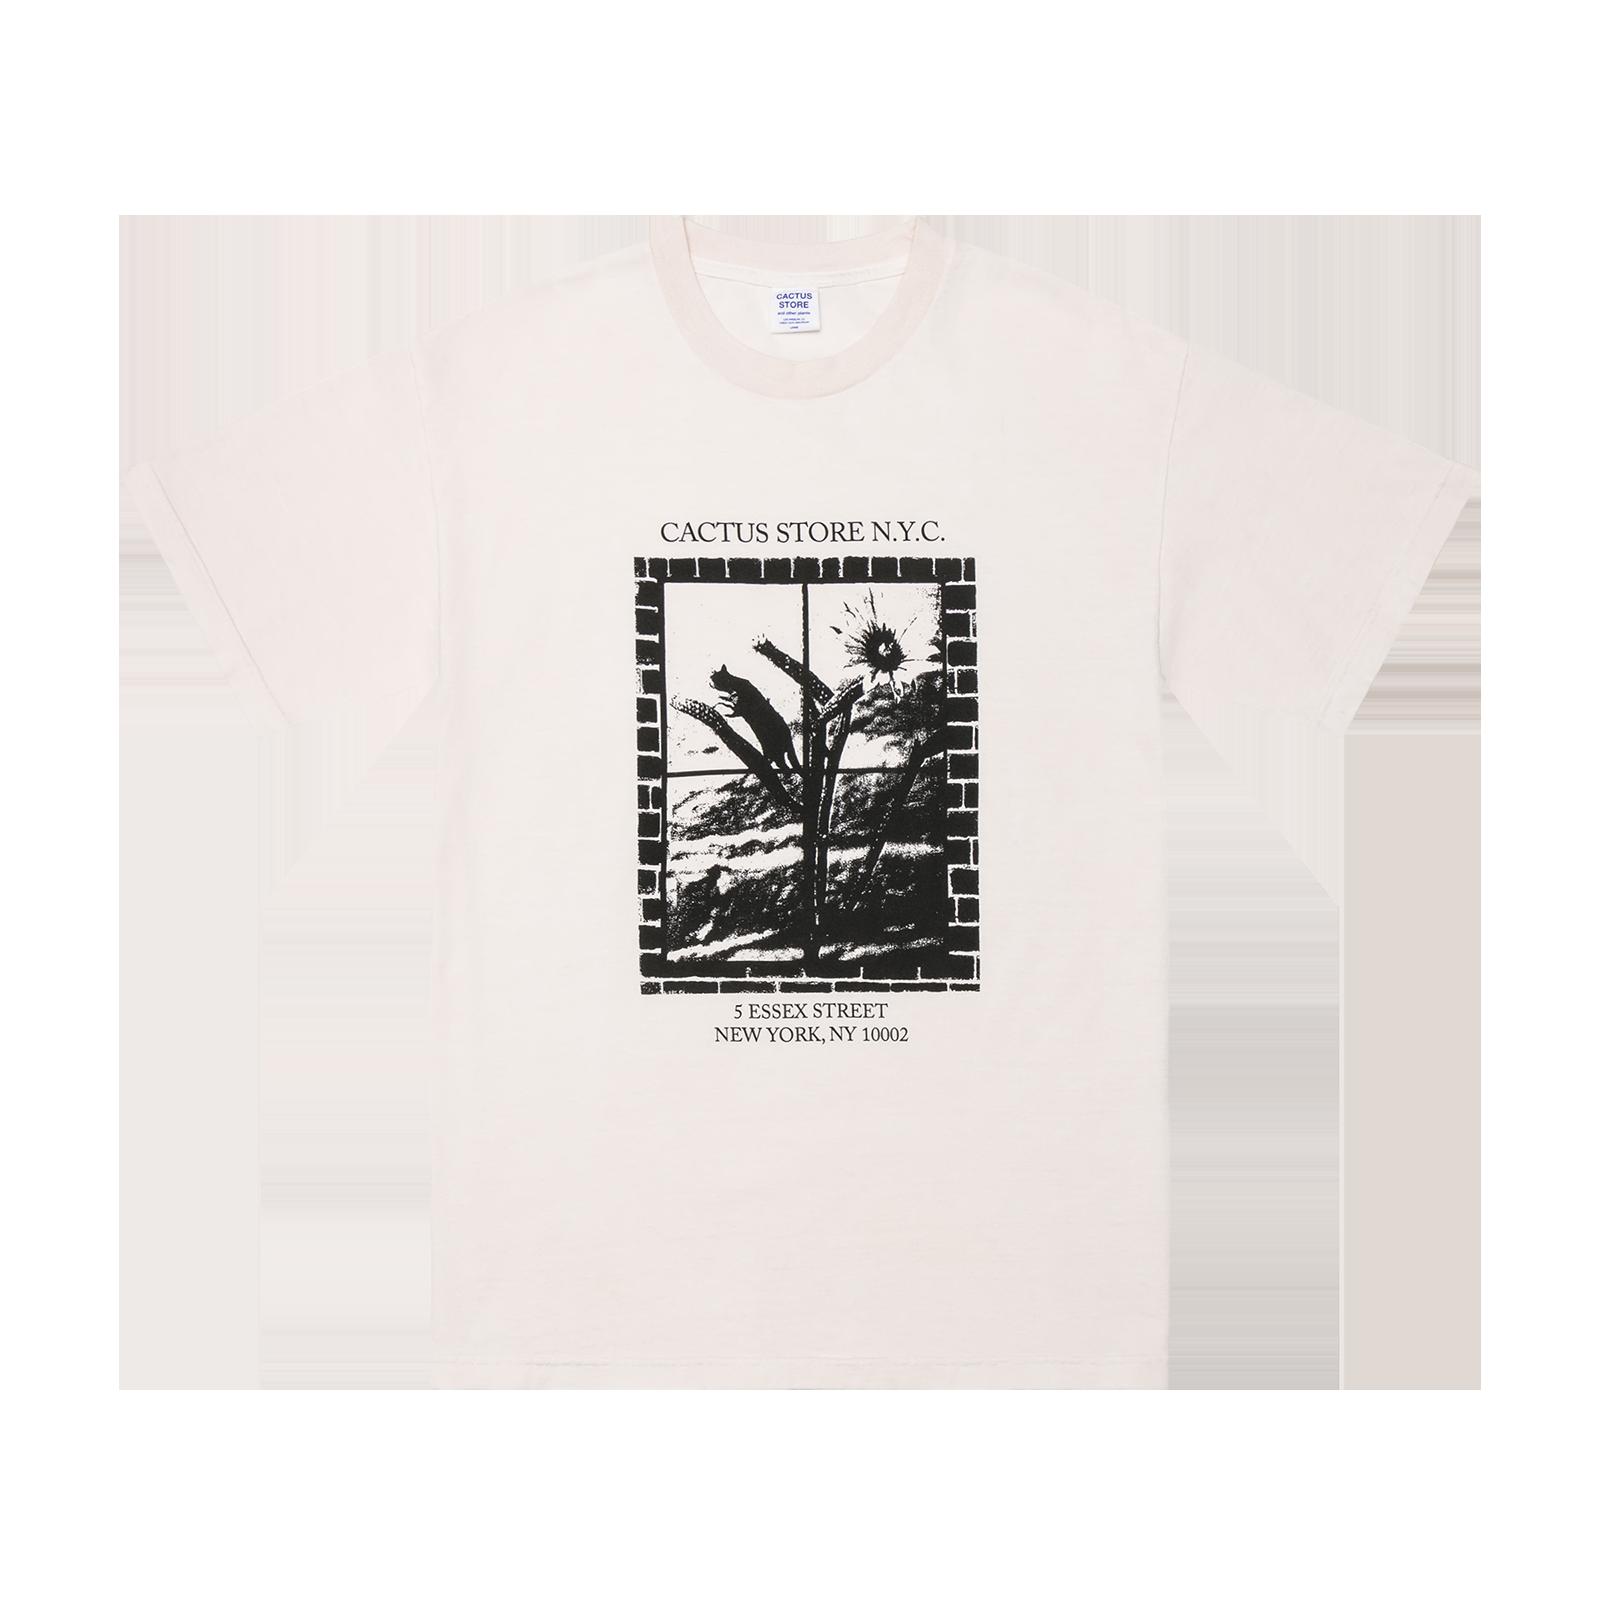 T-shirt flat lay product image